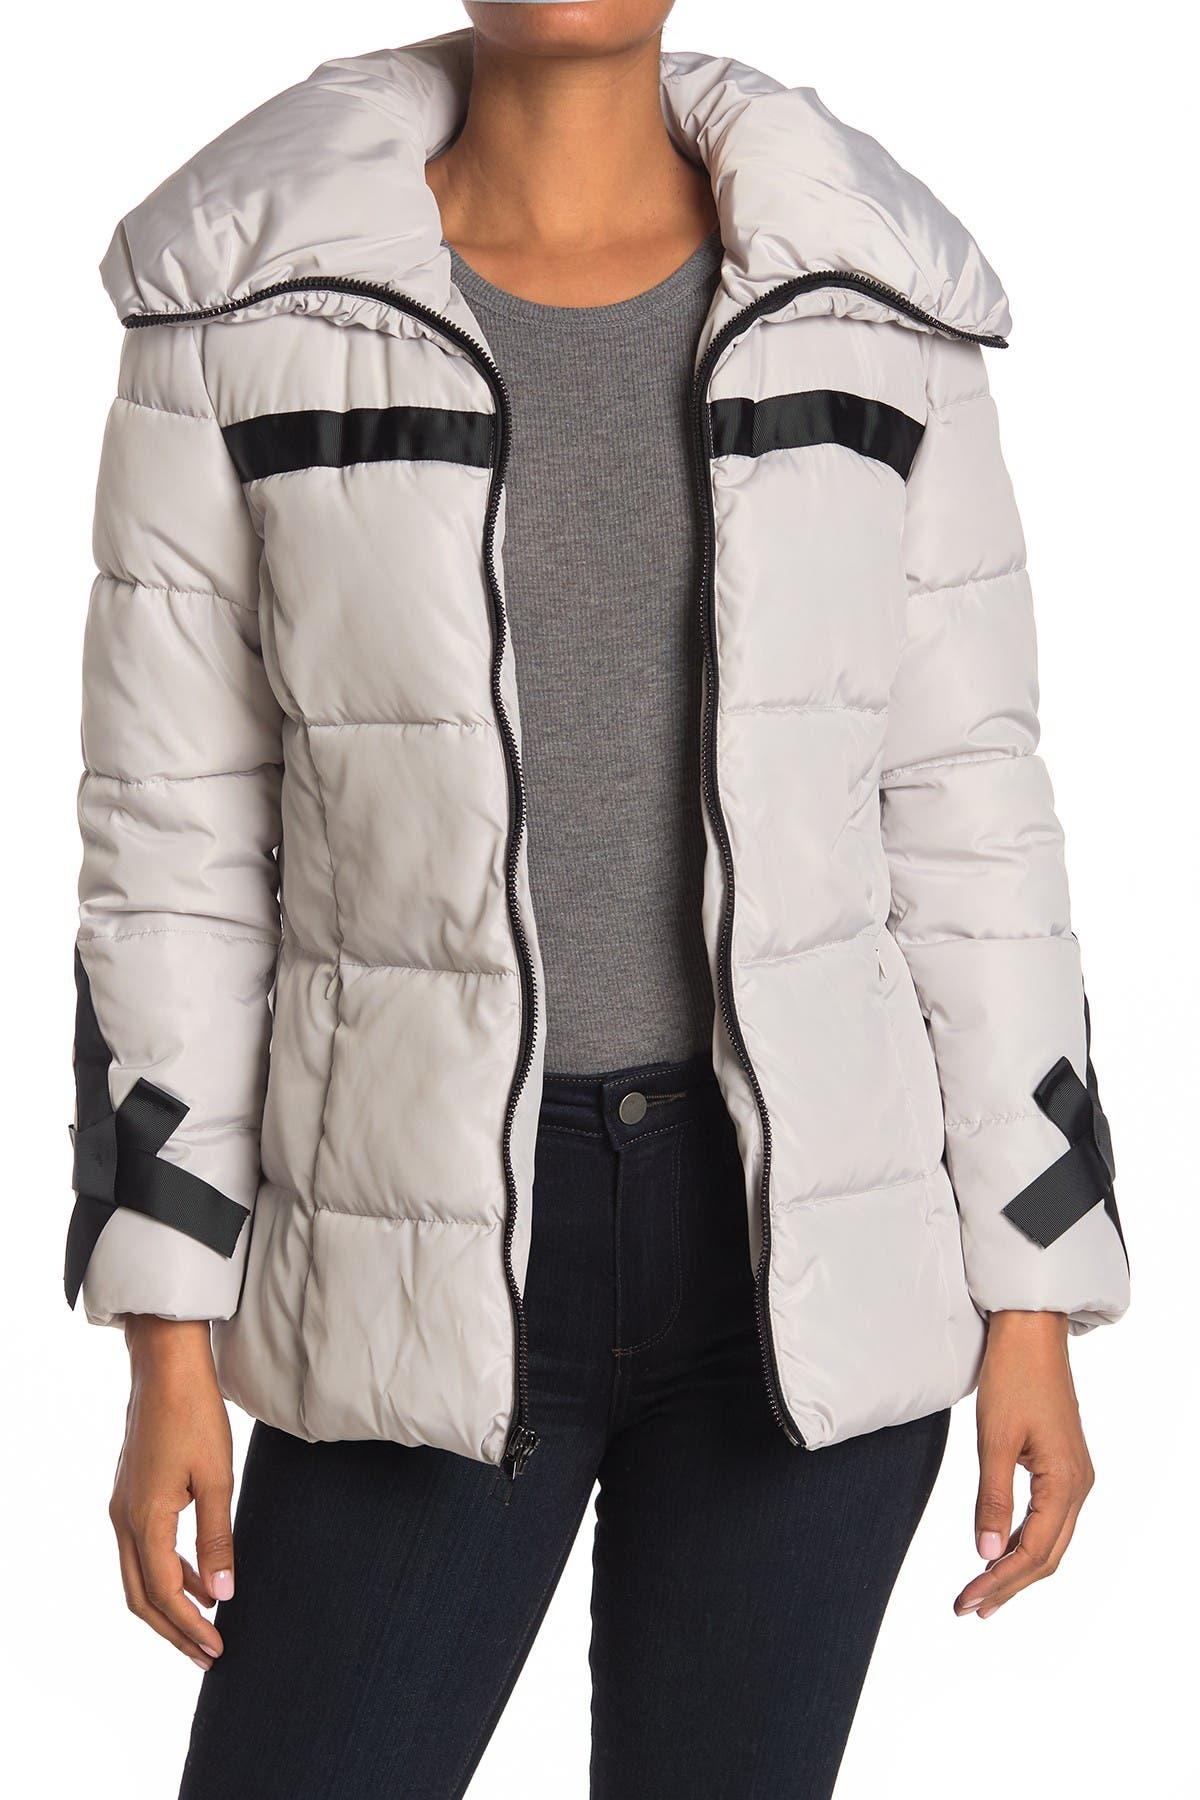 Karl Lagerfeld Paris Zip Puffer Jacket